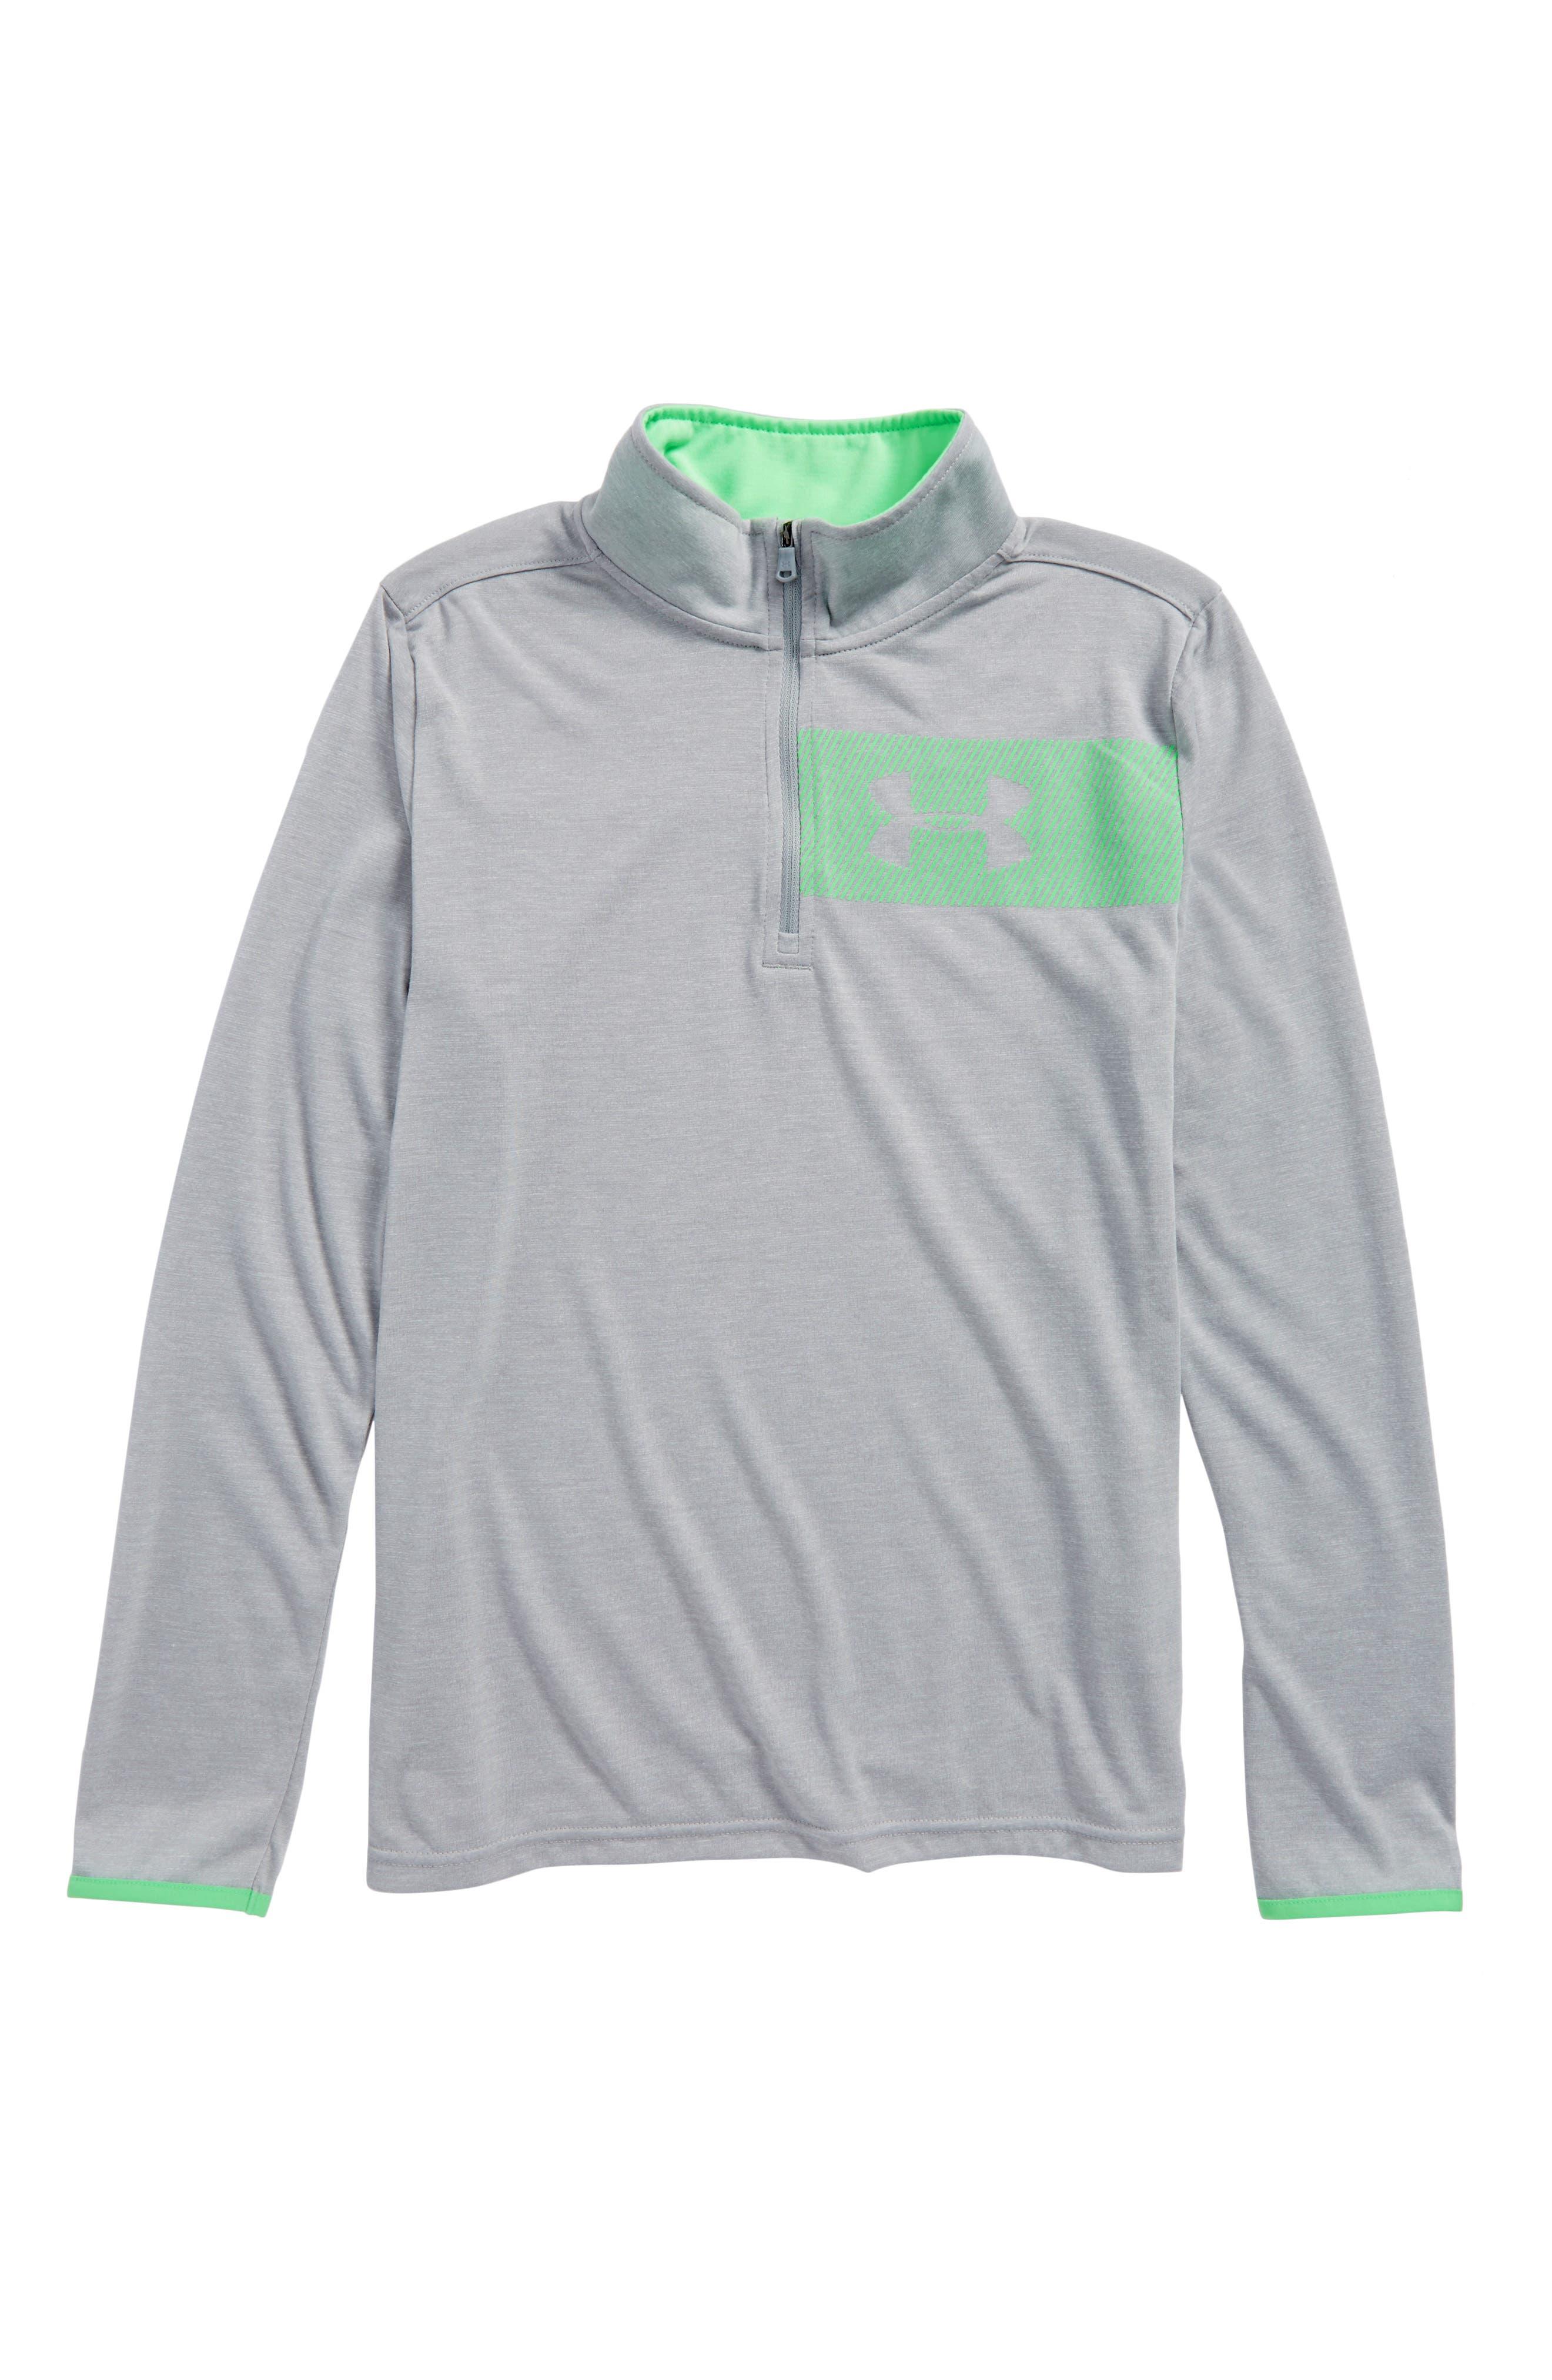 Threadborne HeatGear<sup>®</sup> Quarter Zip Pullover,                             Main thumbnail 1, color,                             Overcast Gray Light Heather